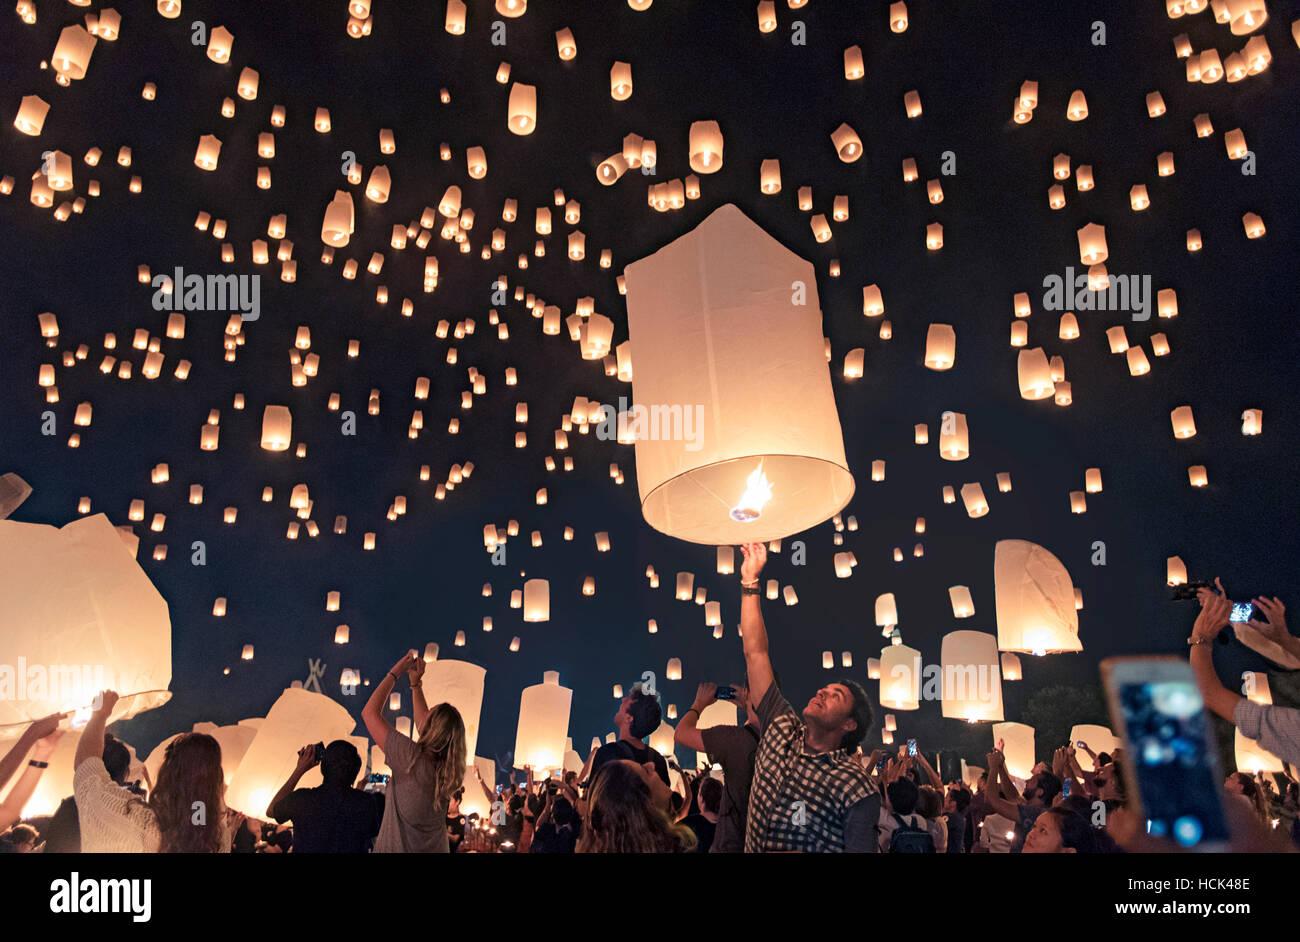 Yi Peng Lantern Festival; Chiang Mai, Thailand - Stock Image